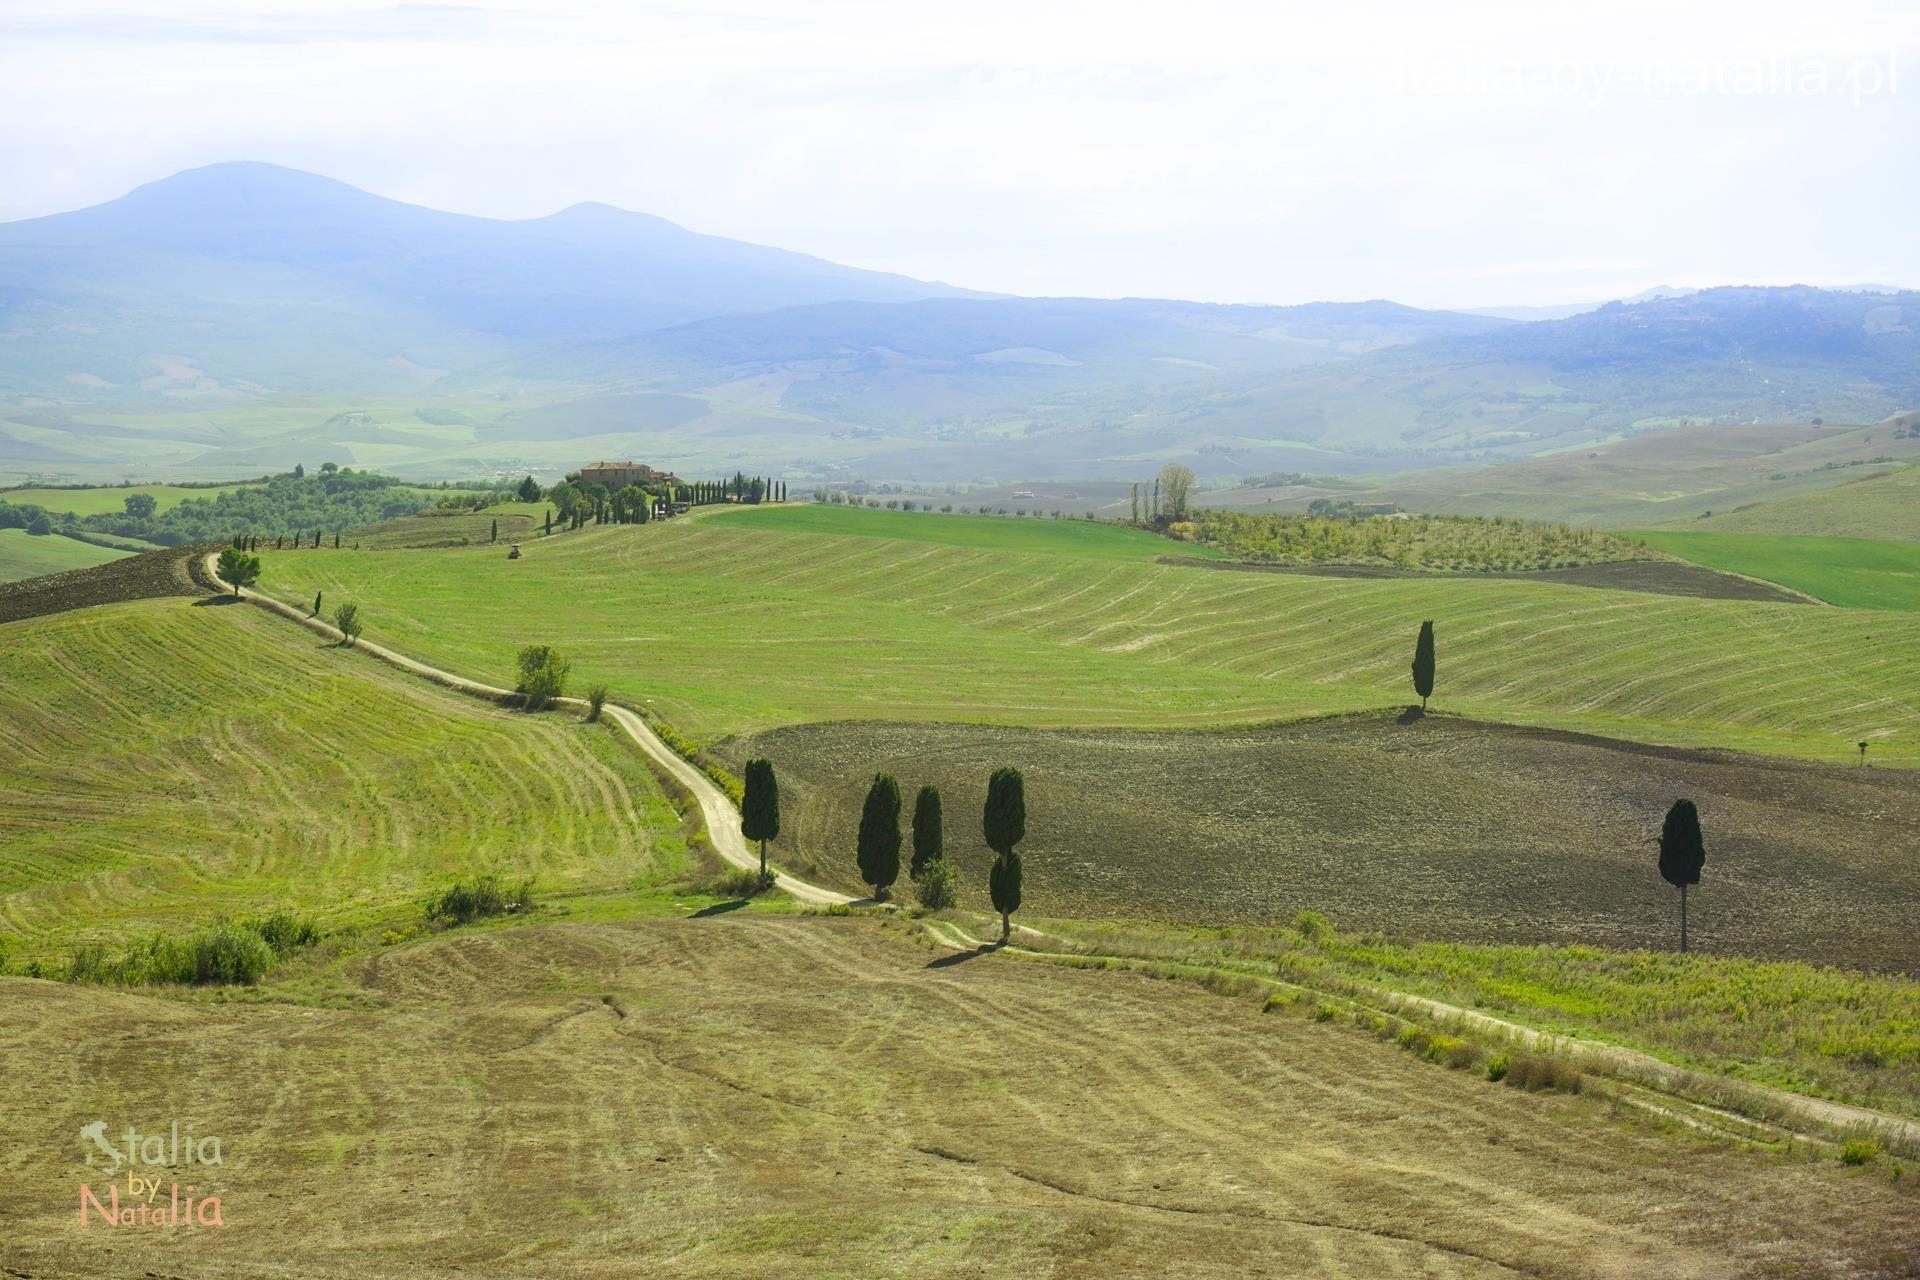 Terrapile Gladiator Val di Orcia widok punkt widokowy panorama jesień Toskania jesienią